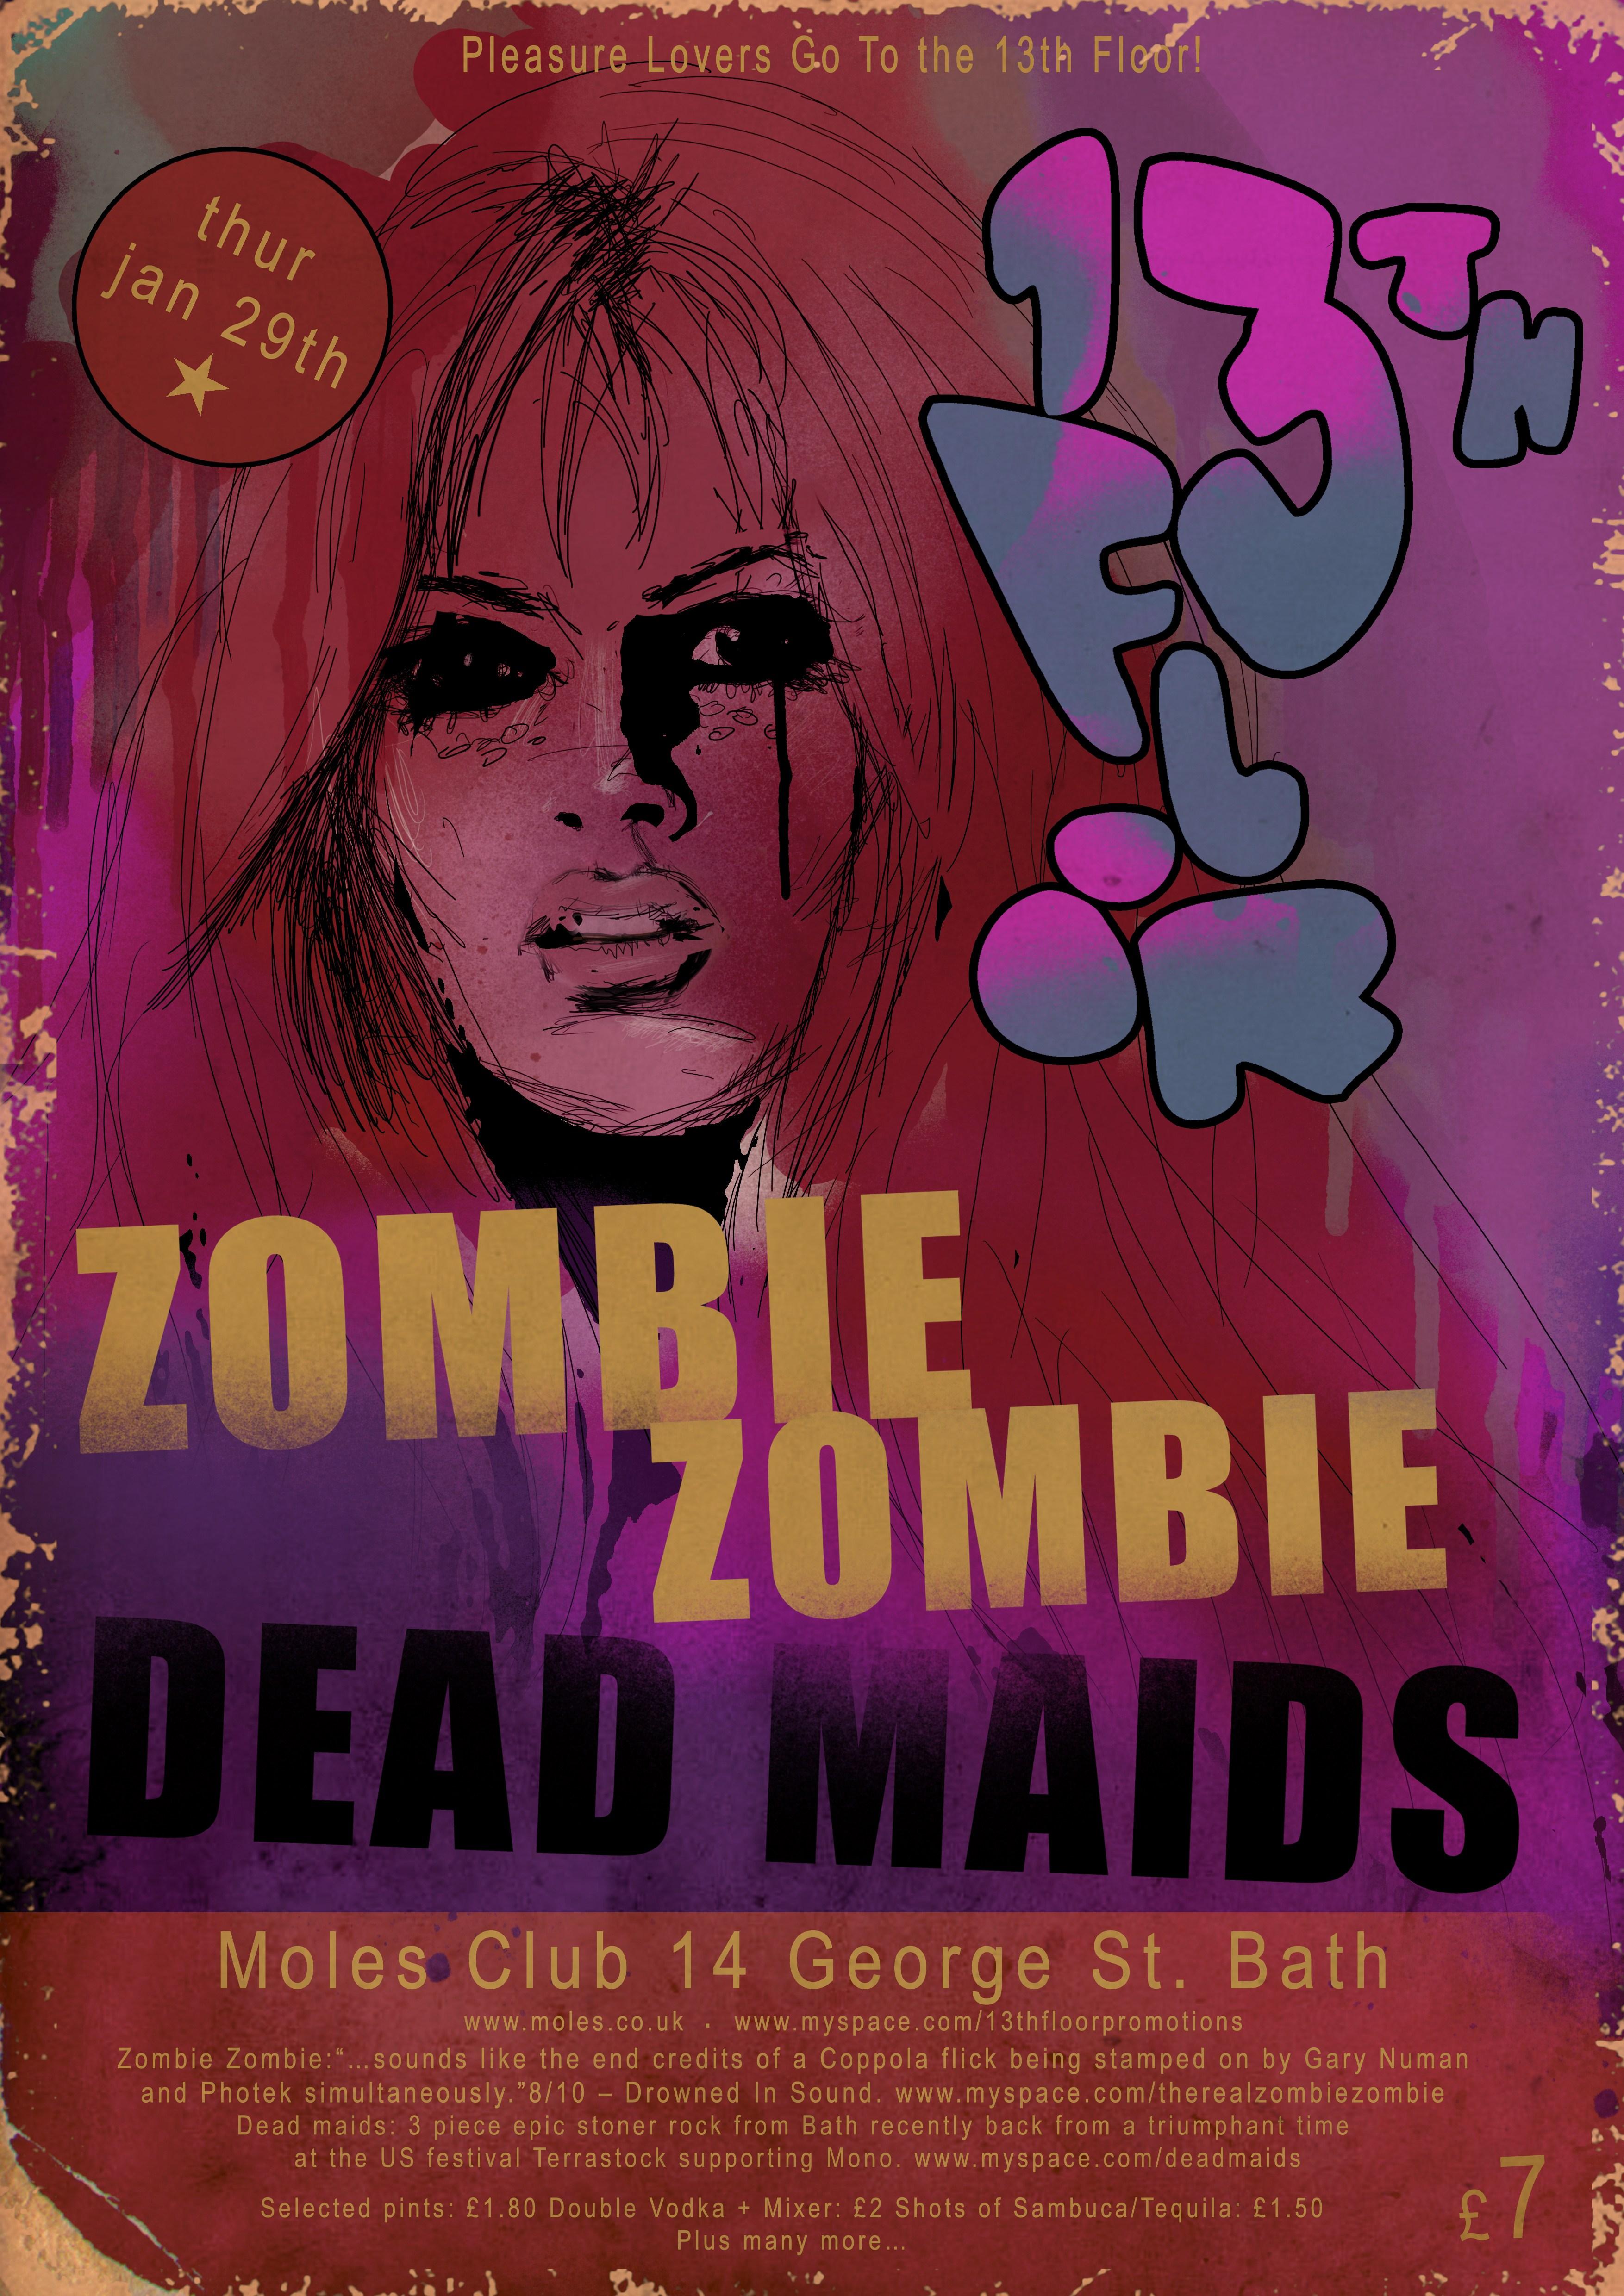 137. Zombie Zombie. JPG copy.jpg